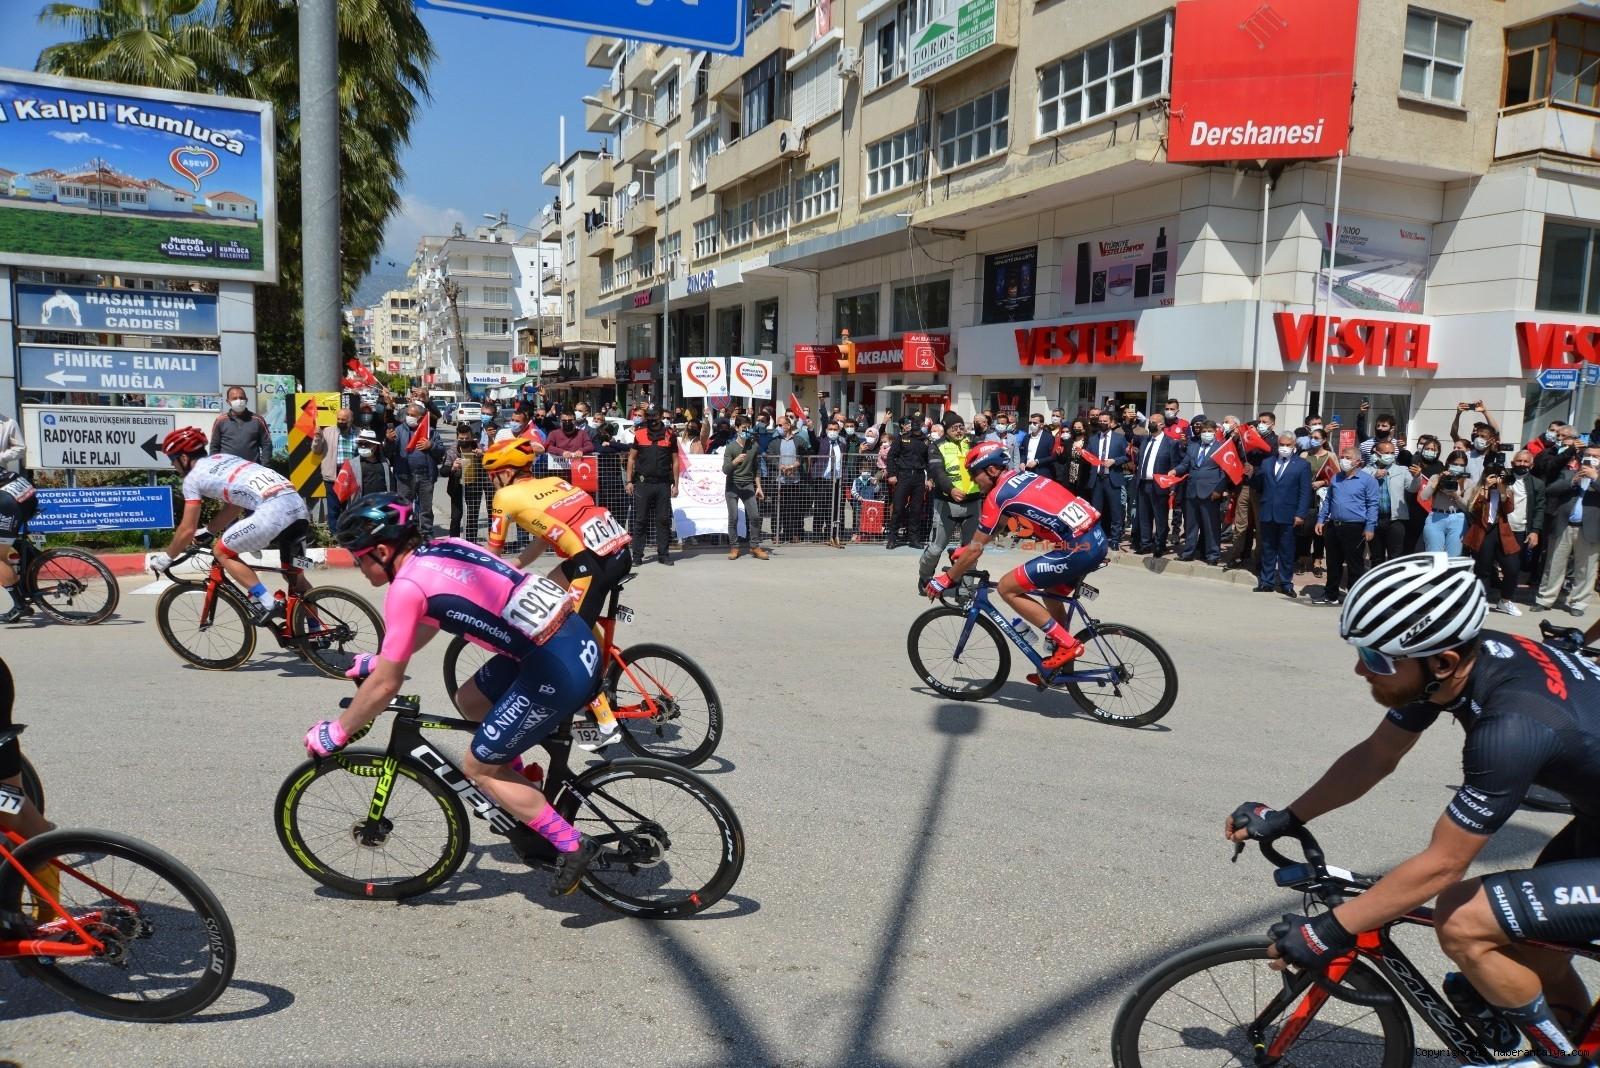 2021/04/56-cumhurbaskanligi-turkiye-bisiklet-turunda-kaza-ucuz-atlatildi-20210415AW29-4.jpg